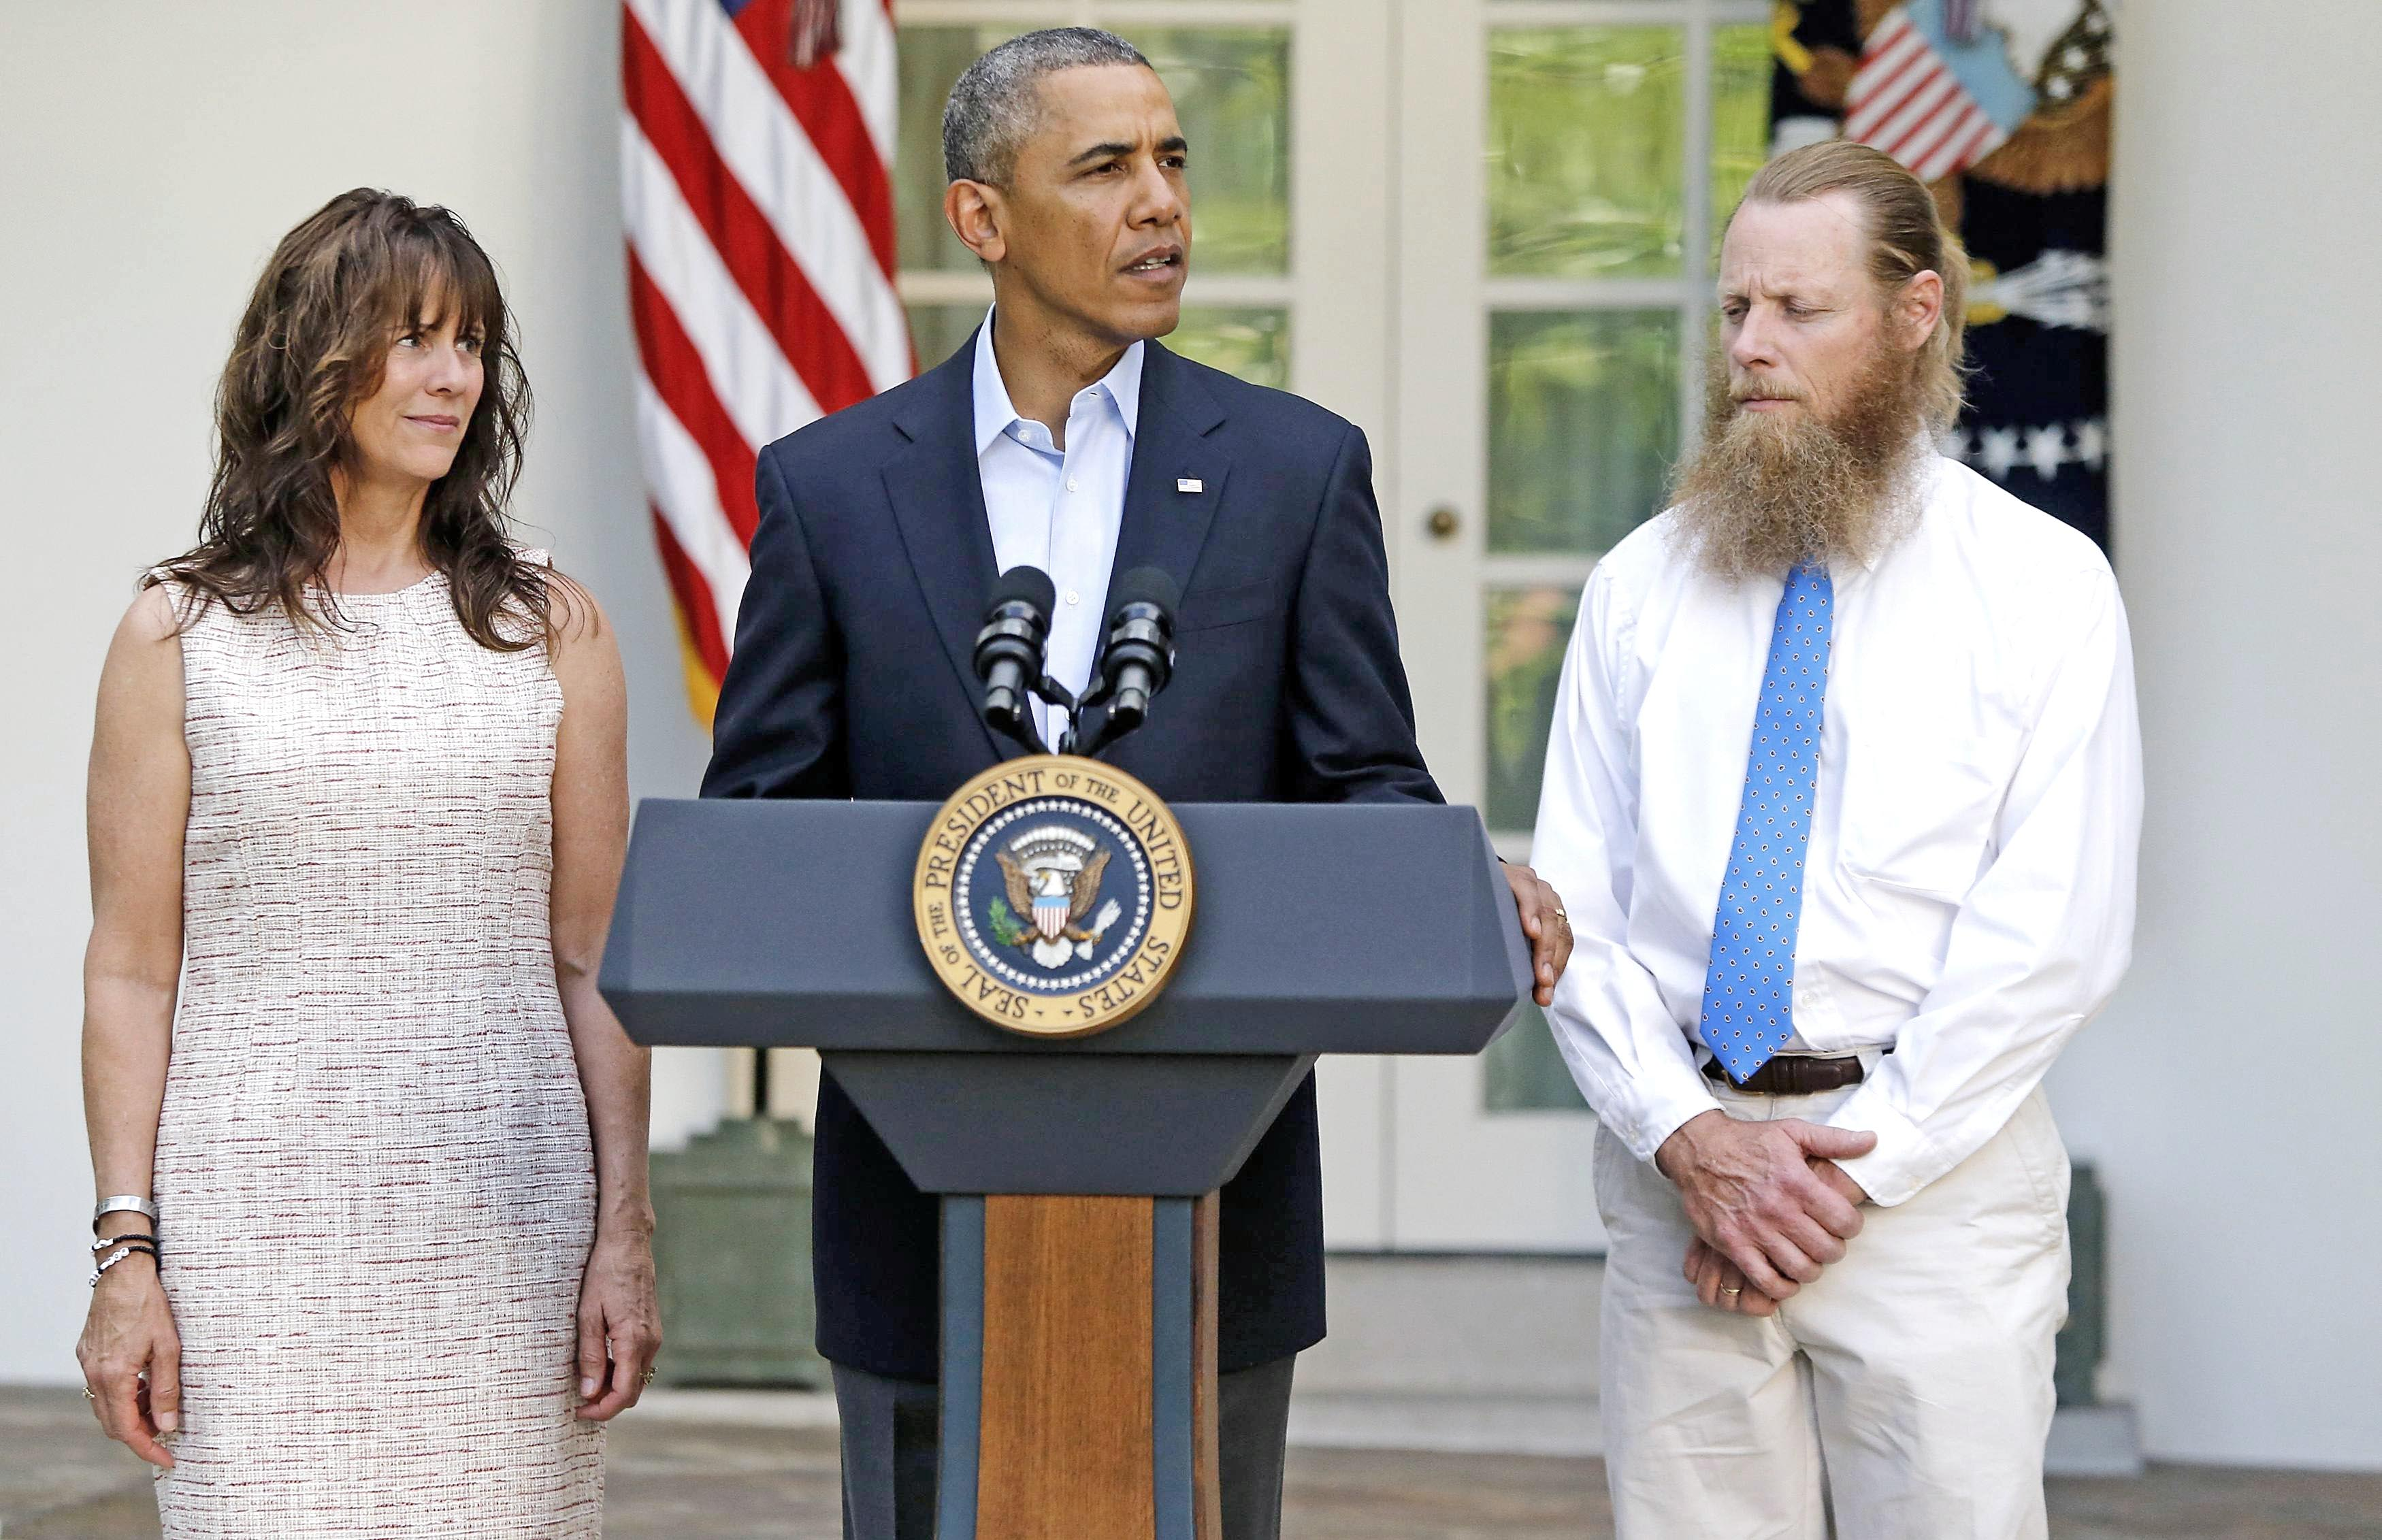 Bowe Bergdahl: How the Story Turned on Obama | Time